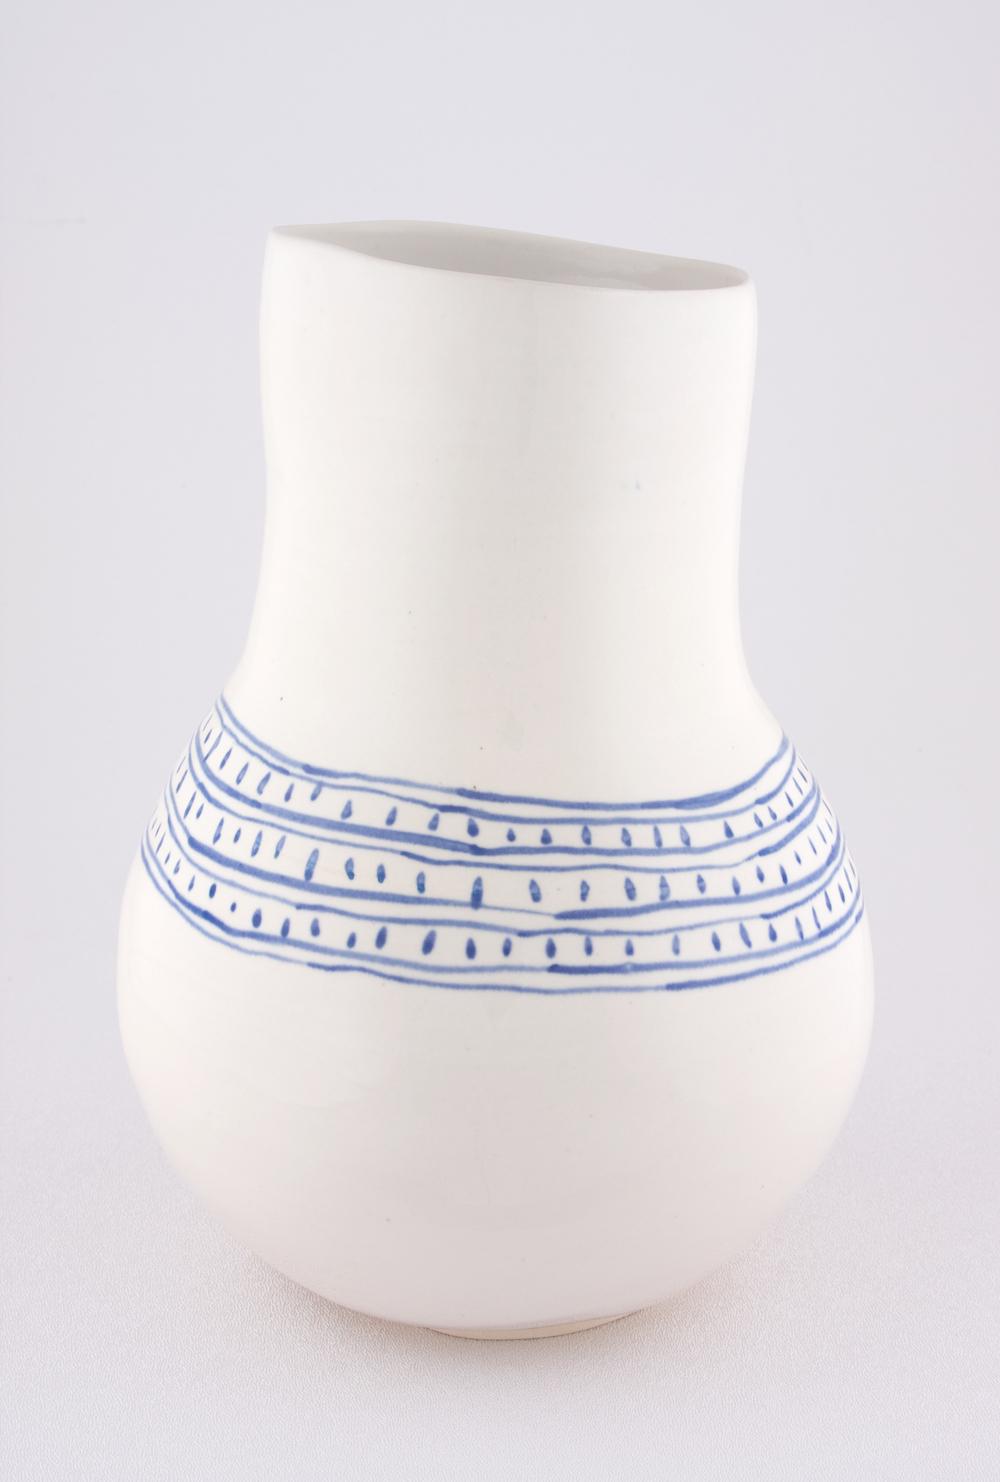 "Shio Kusaka Untitled (blue line and dot) 2009 Porcelain 9 3/4"" x 7"" SK055"